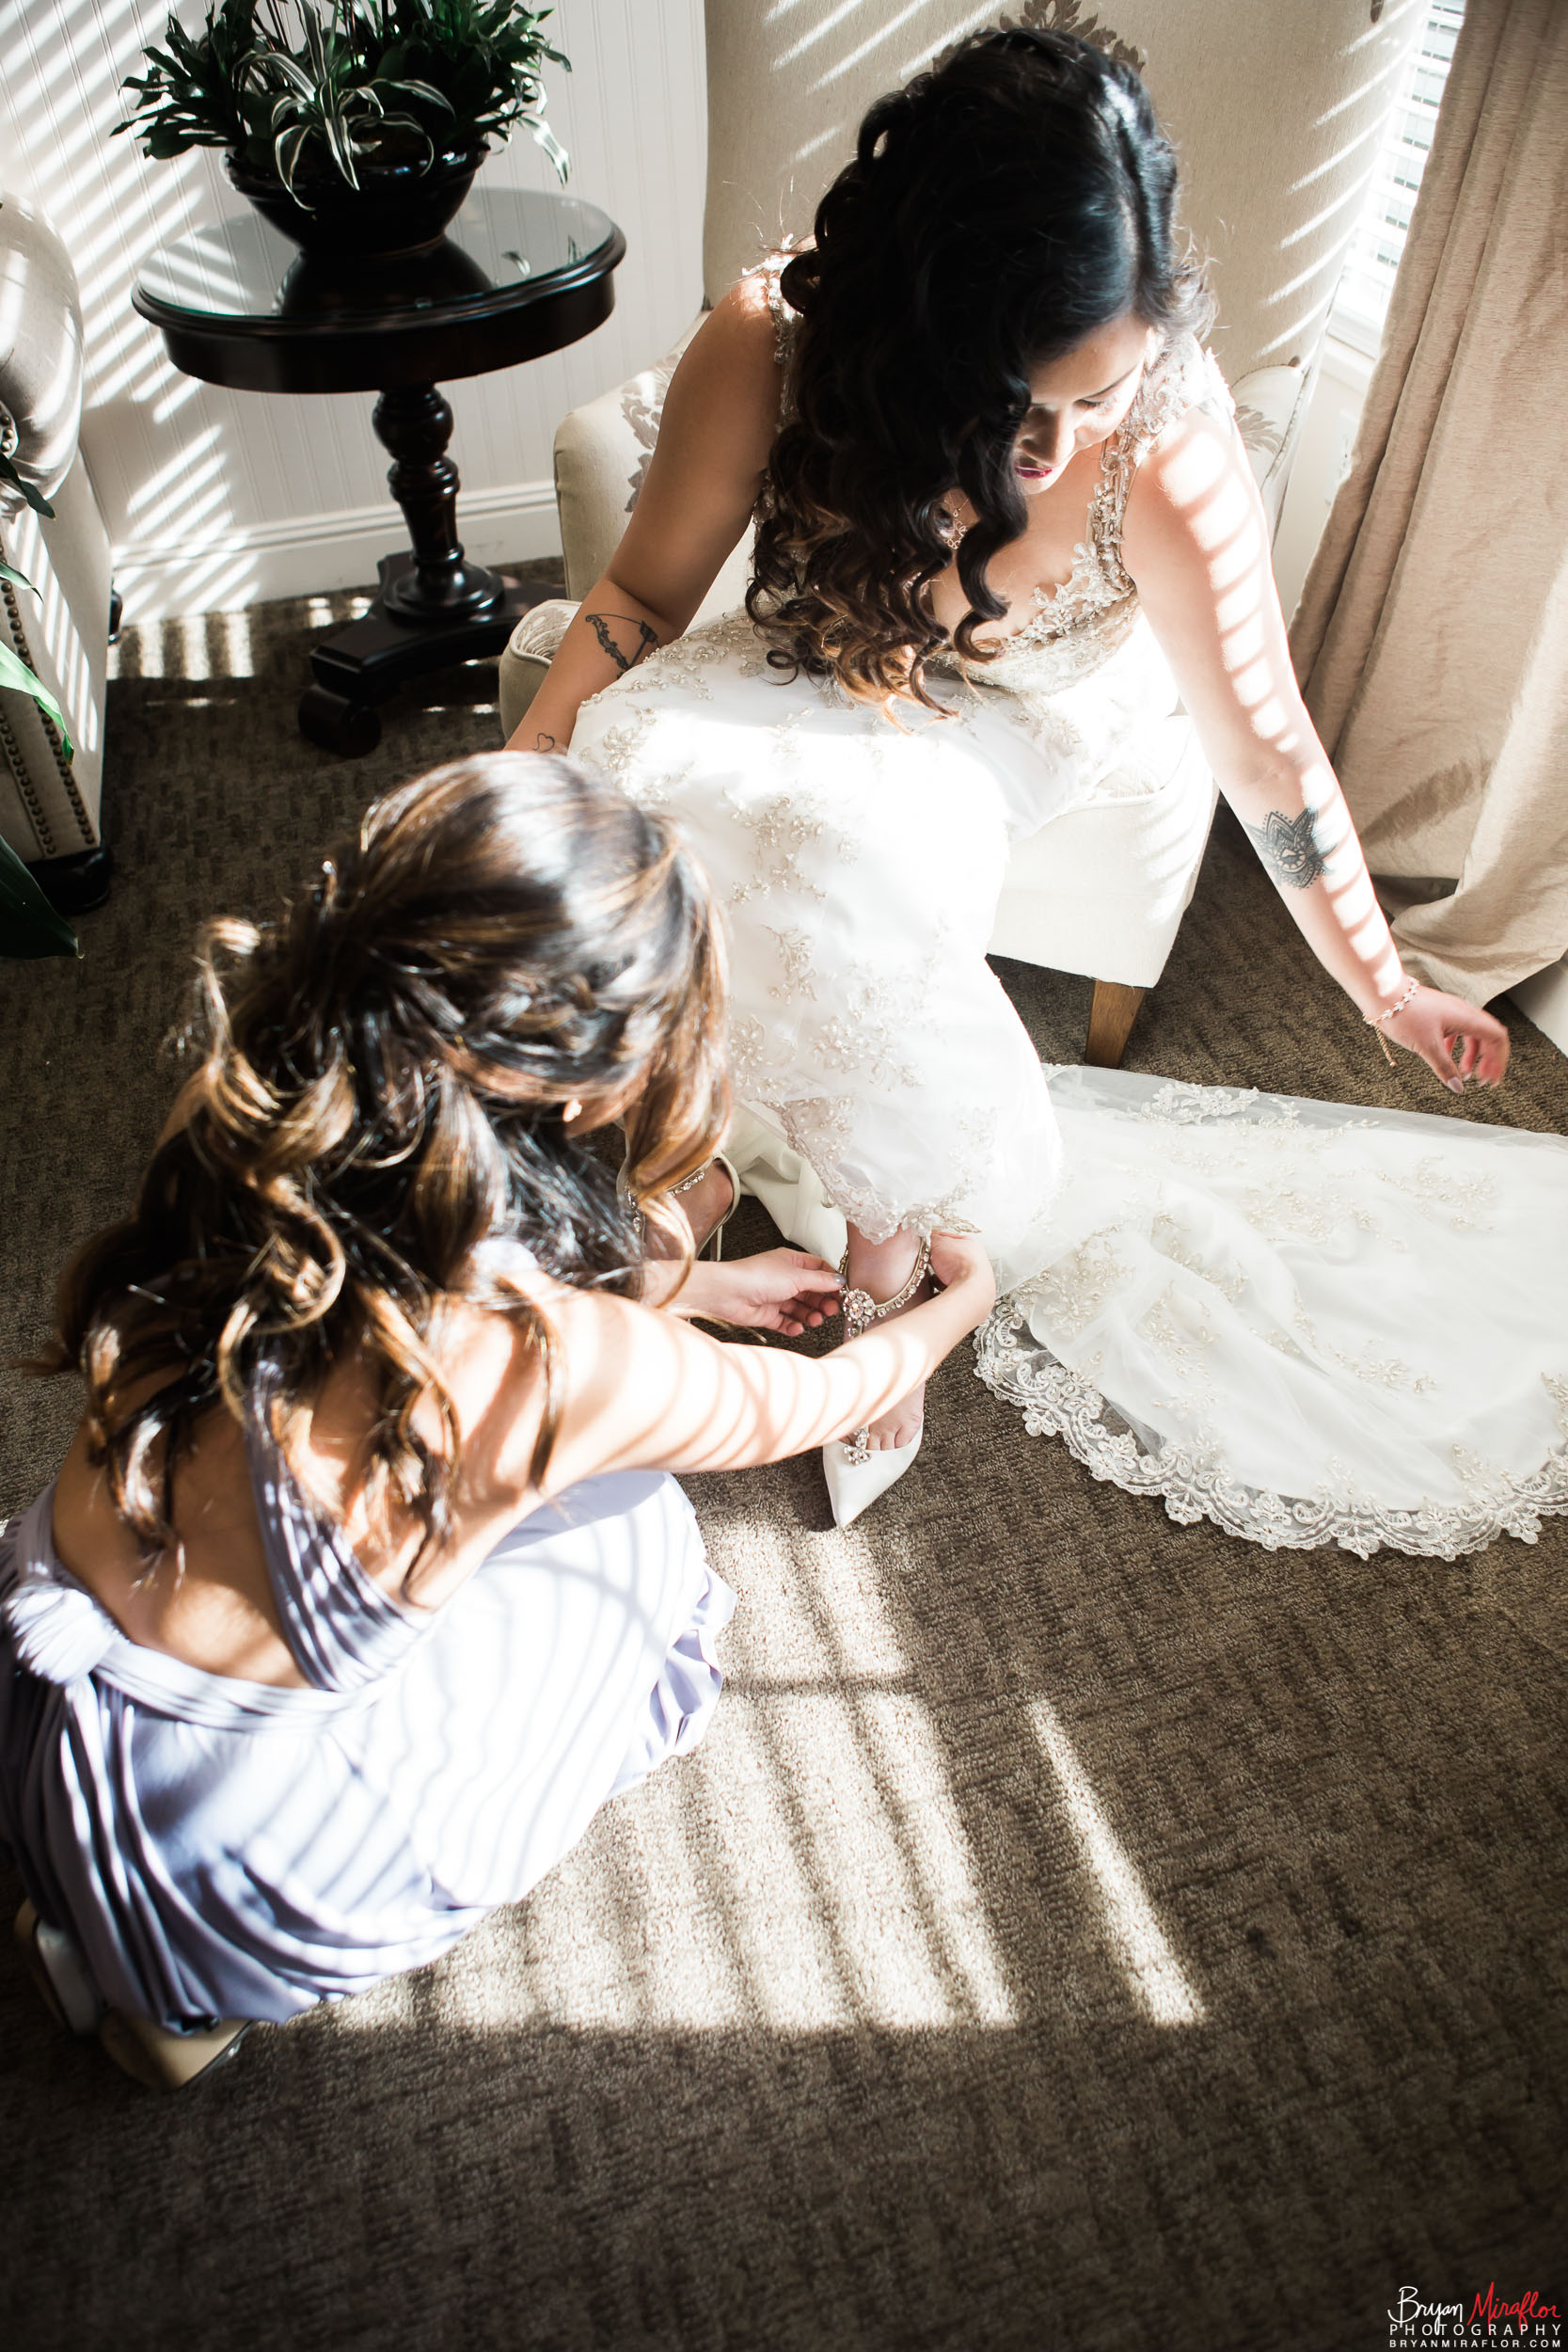 Bryan-Miraflor-Photography-Hannah-Jonathan-Married-Grand-Traditions-Estate-Gardens-Fallbrook-20171222-036.jpg